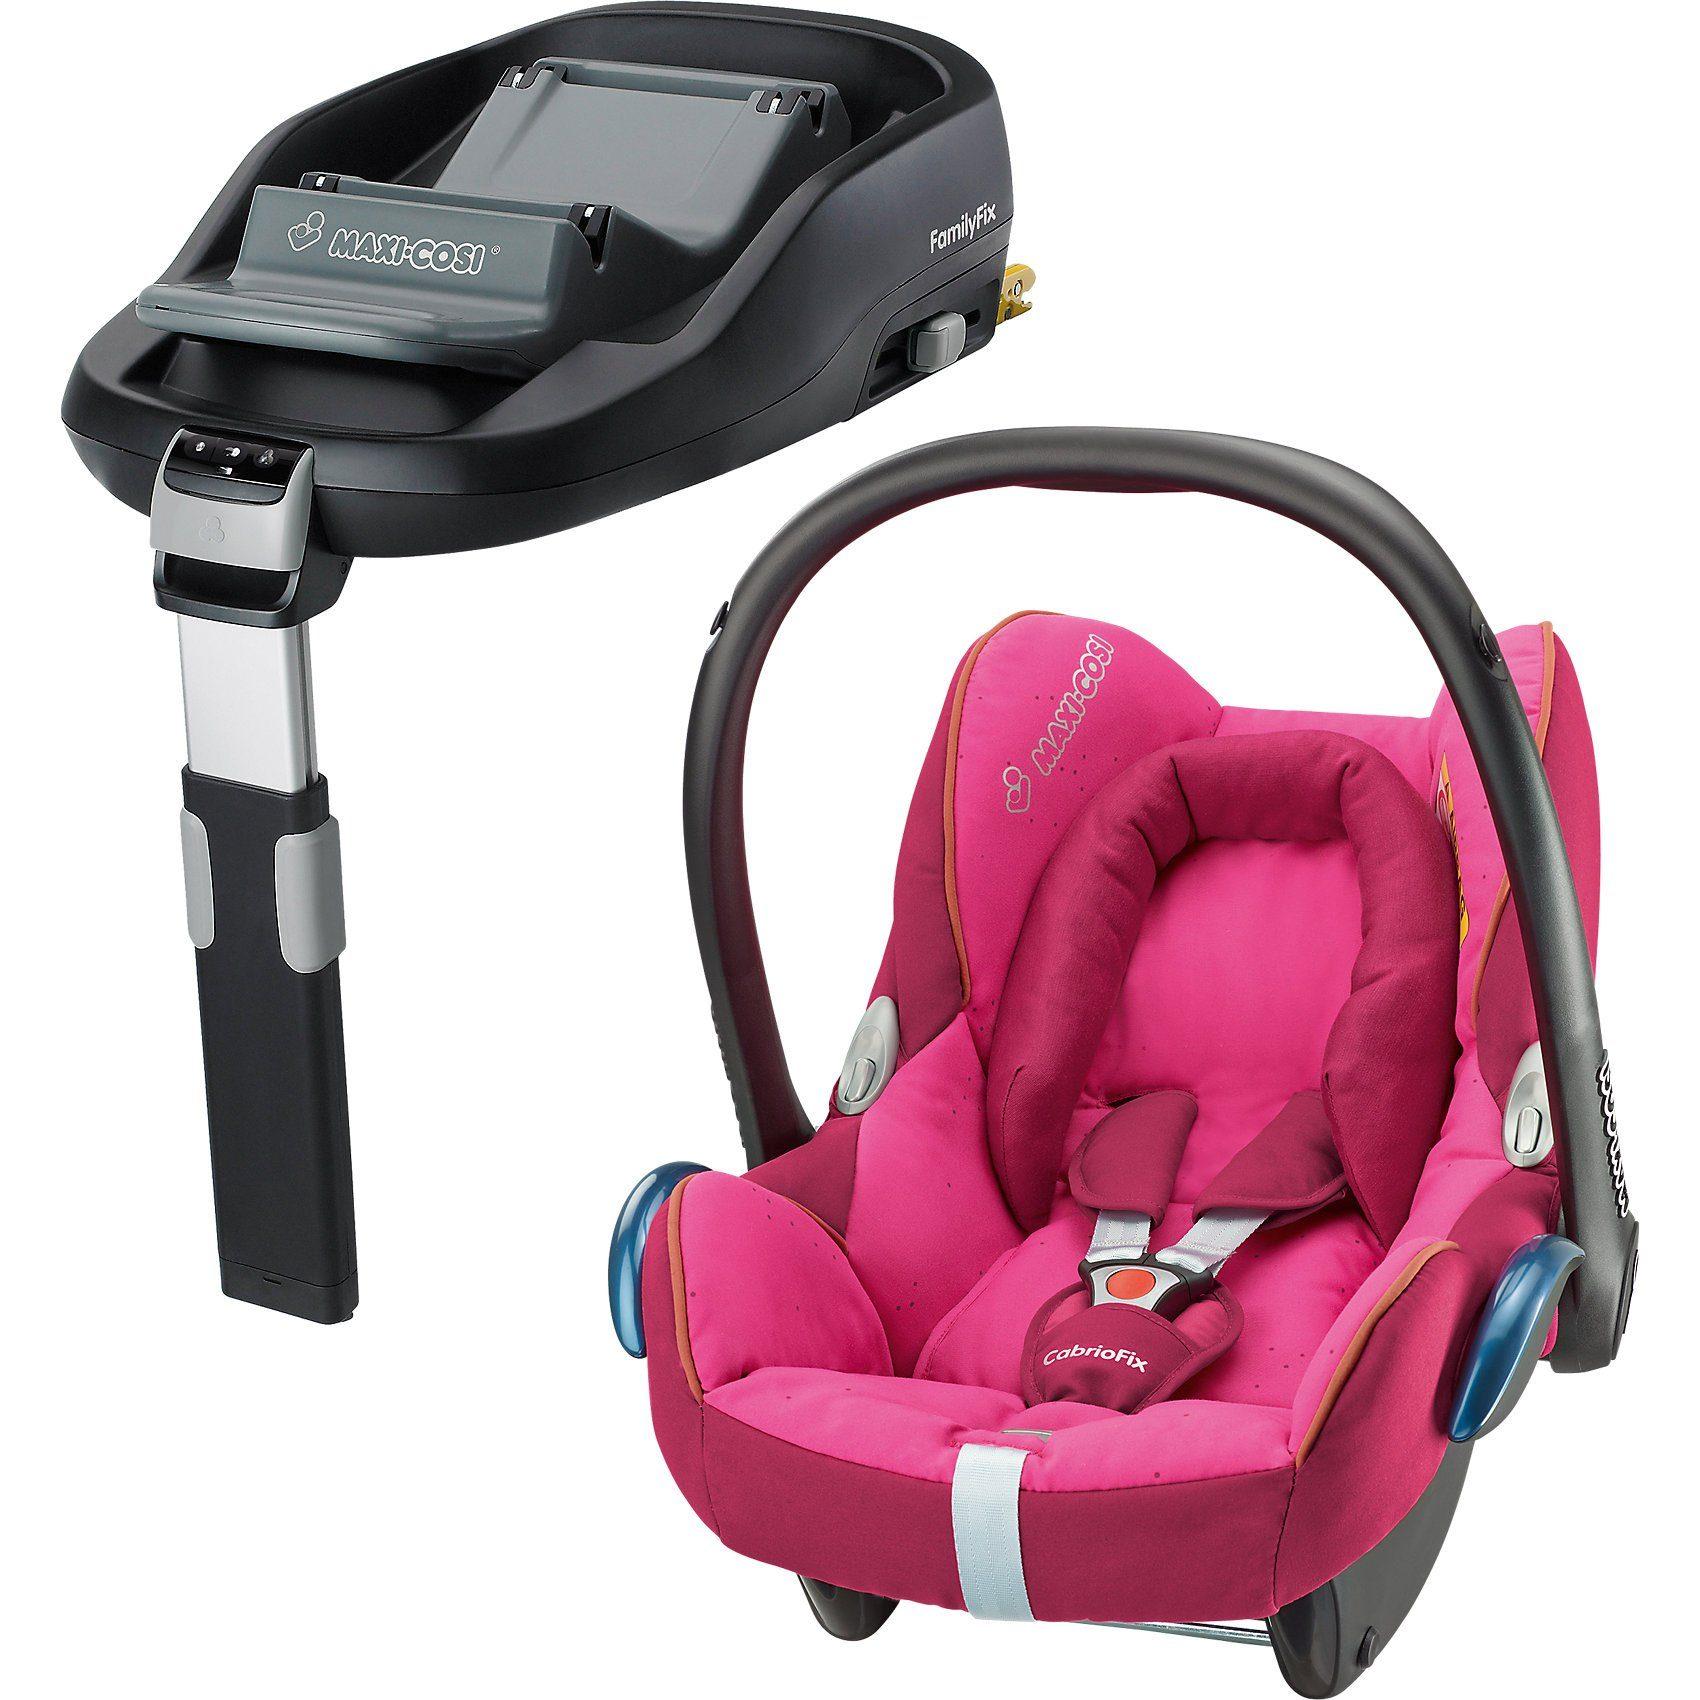 Maxi-Cosi Babyschale Cabriofix, berry pink, inkl. FamilyFix